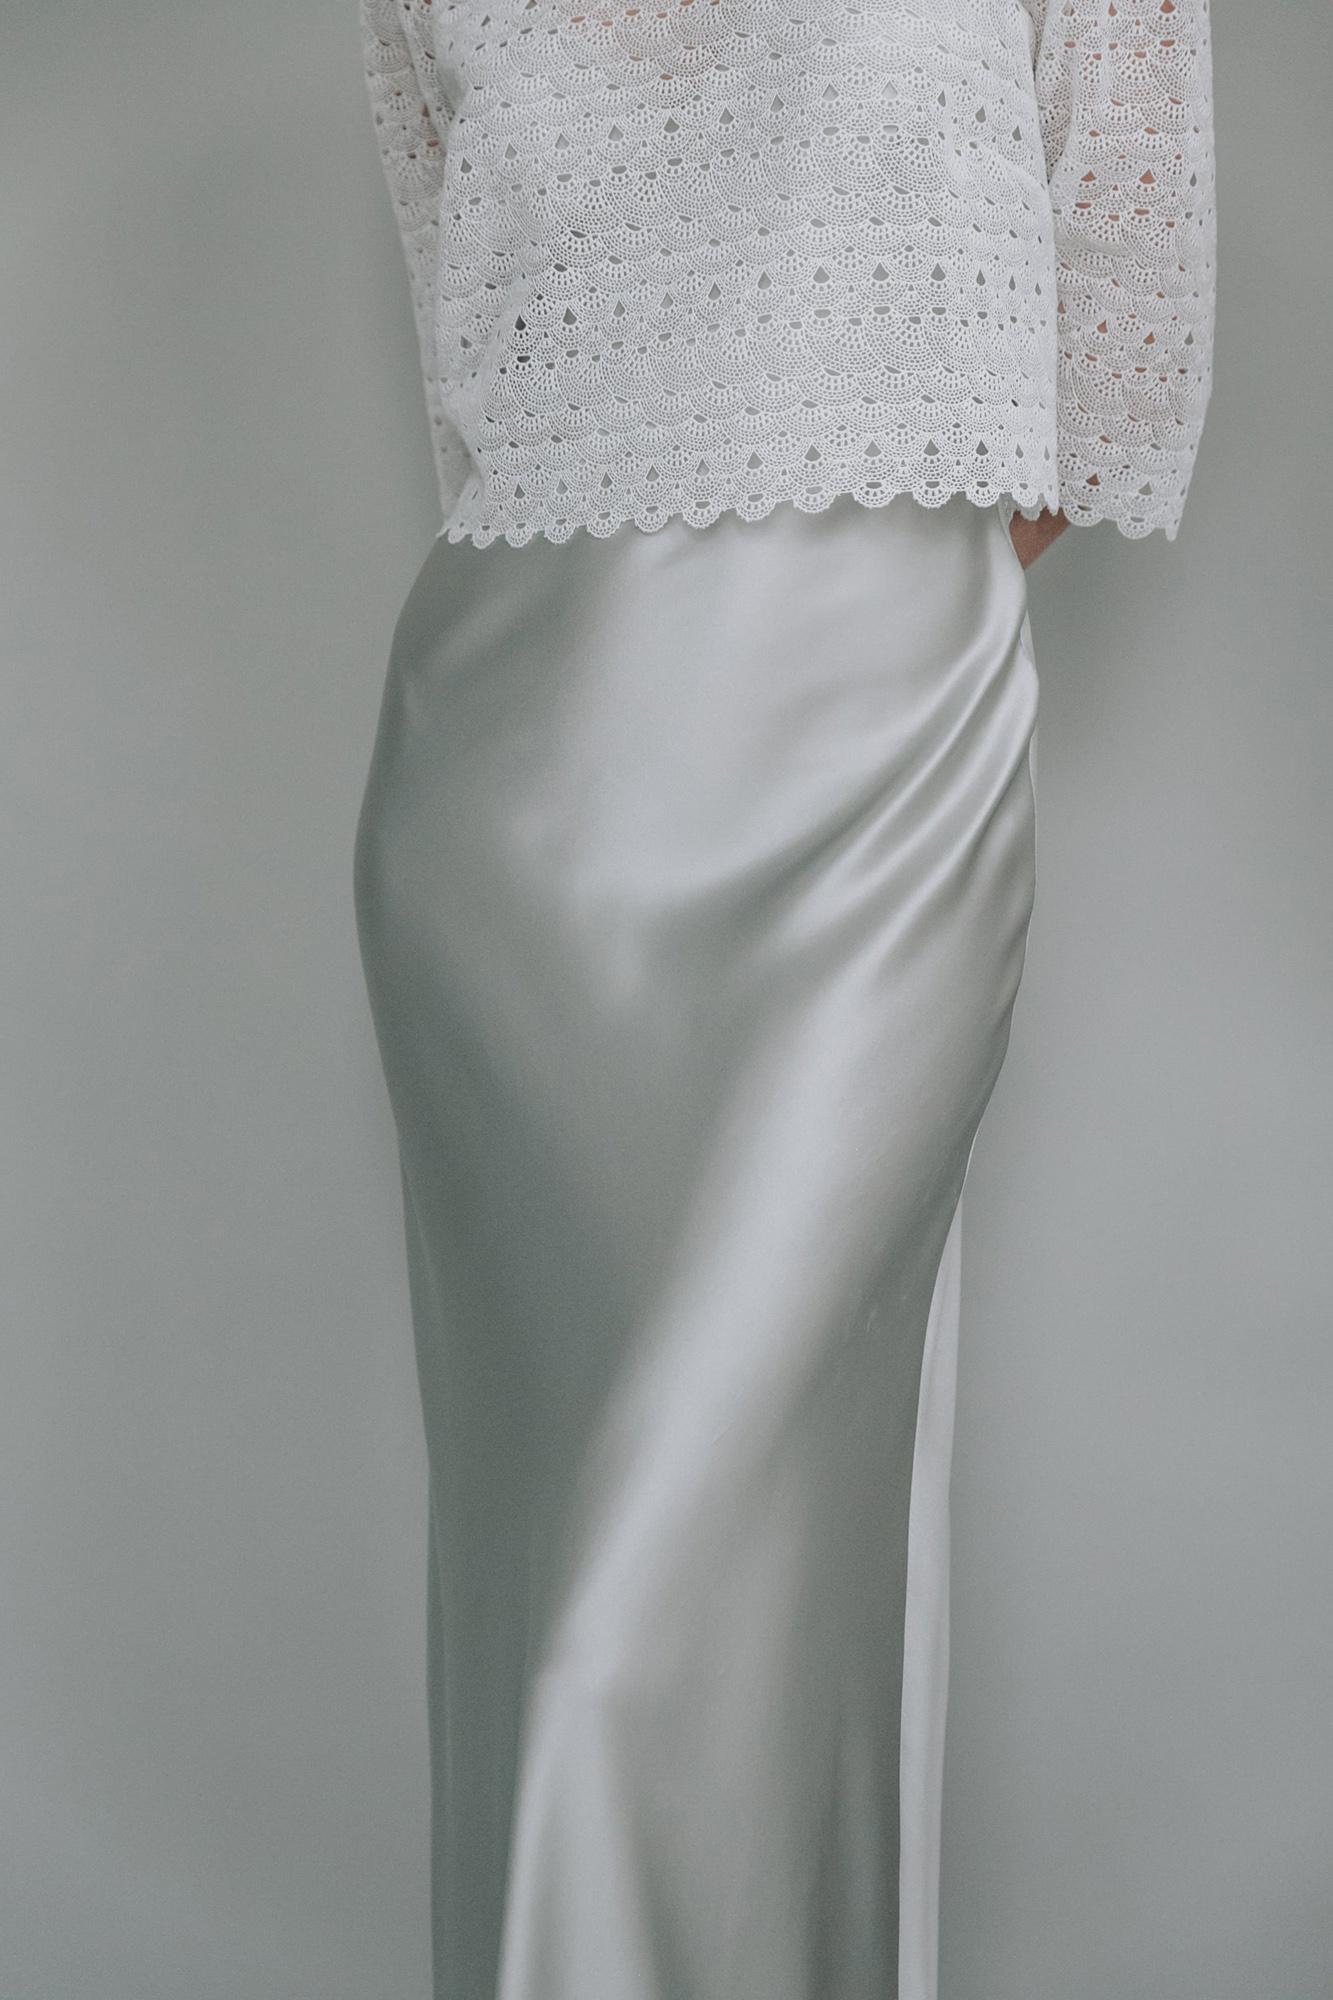 Kate-Beaumont-Sheffield-Freesia-Guipure-Lace-Jacket-Cosmos-Bias-Cut-Silver-Silk-Wedding-Gown-6.jpg